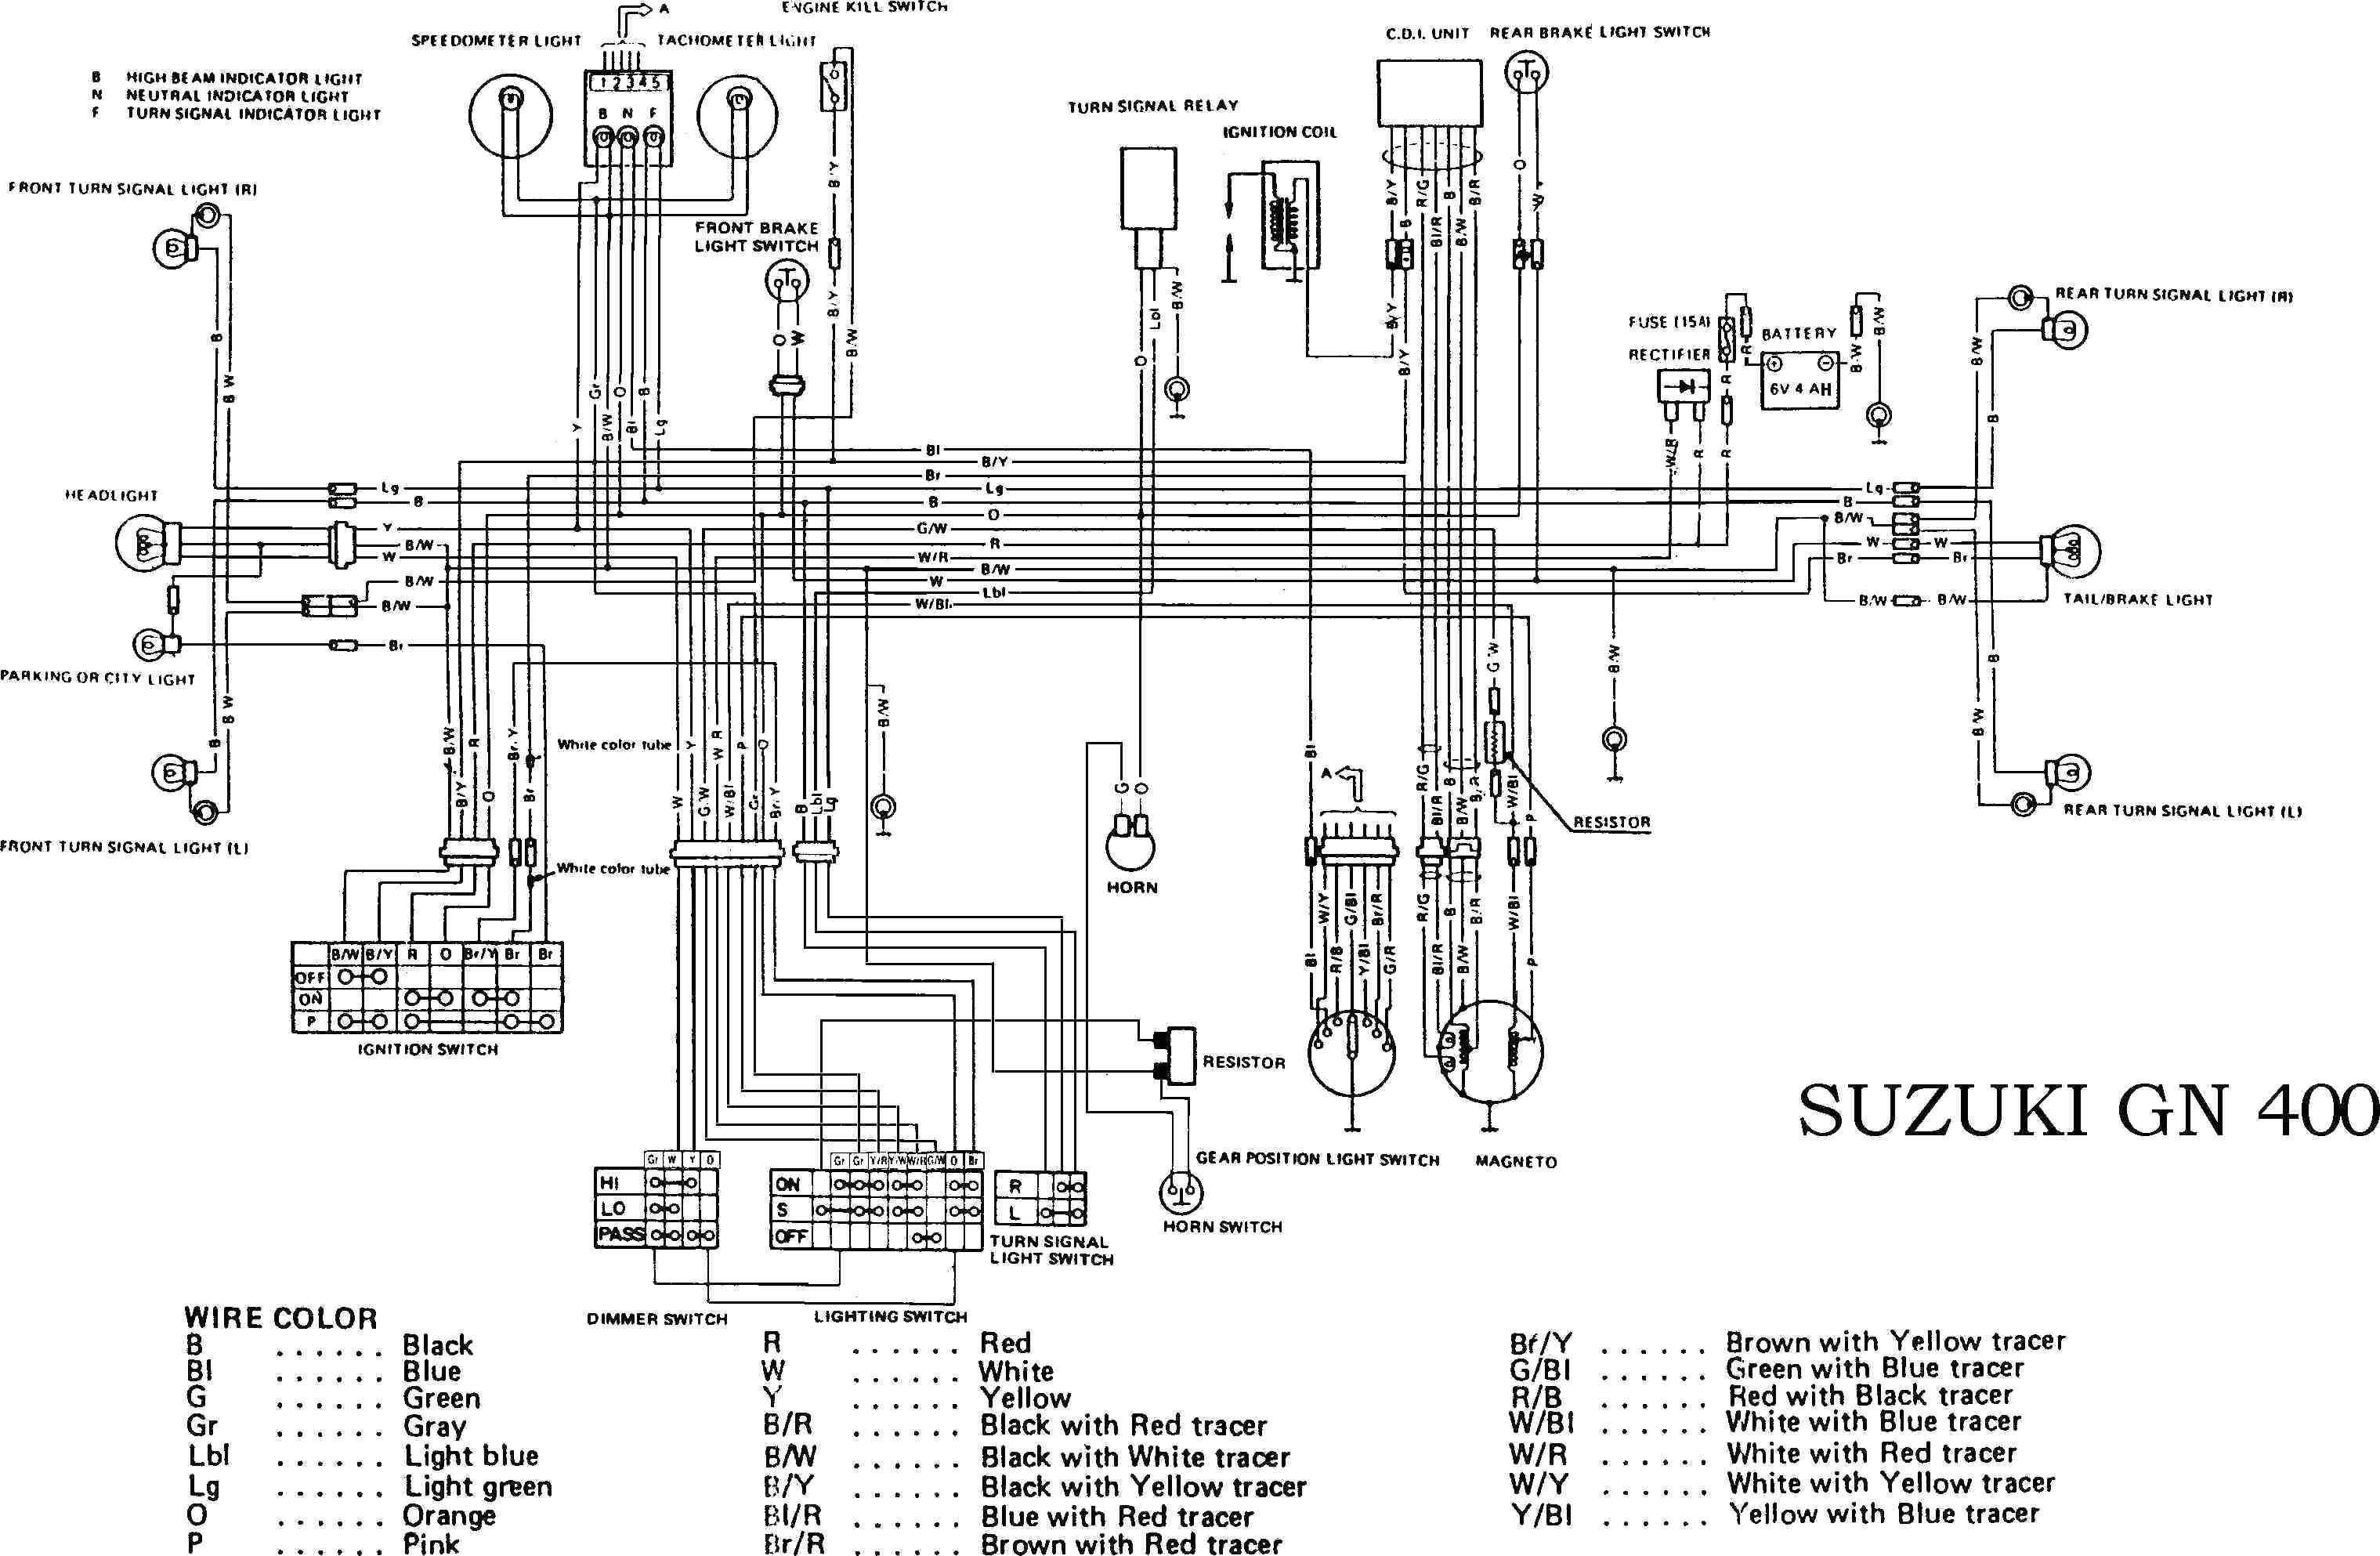 Subaru Color Code Wiring Diagram | Wiring Diagram - Subaru Wiring Diagram Color Codes